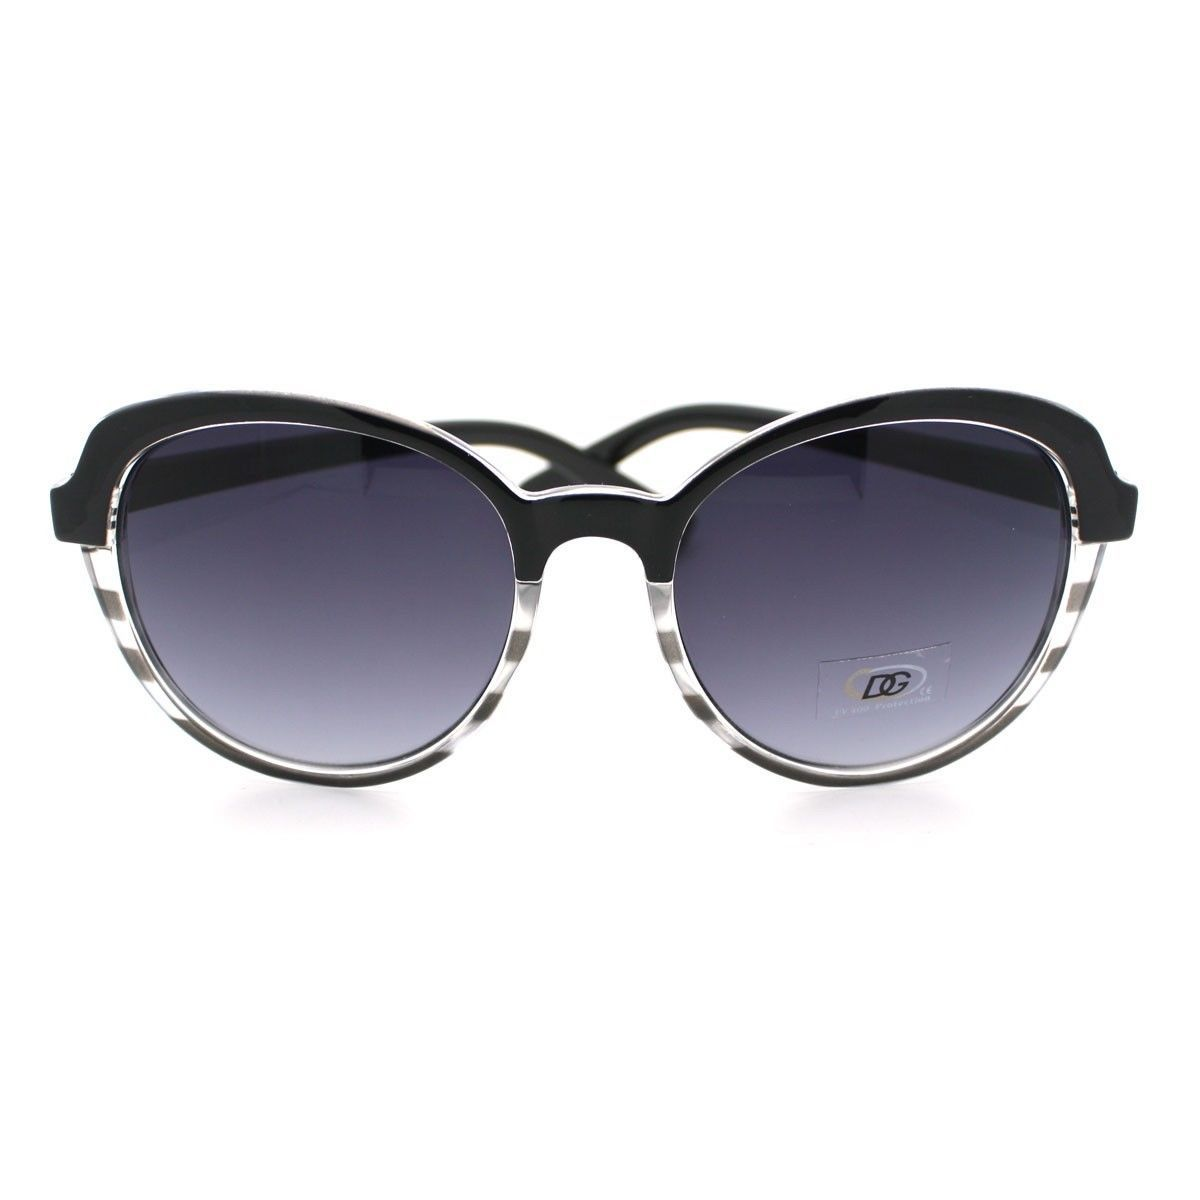 Womens Sunglasses Classic Casual Fashion Sunnies 2-Tone Print BLACK